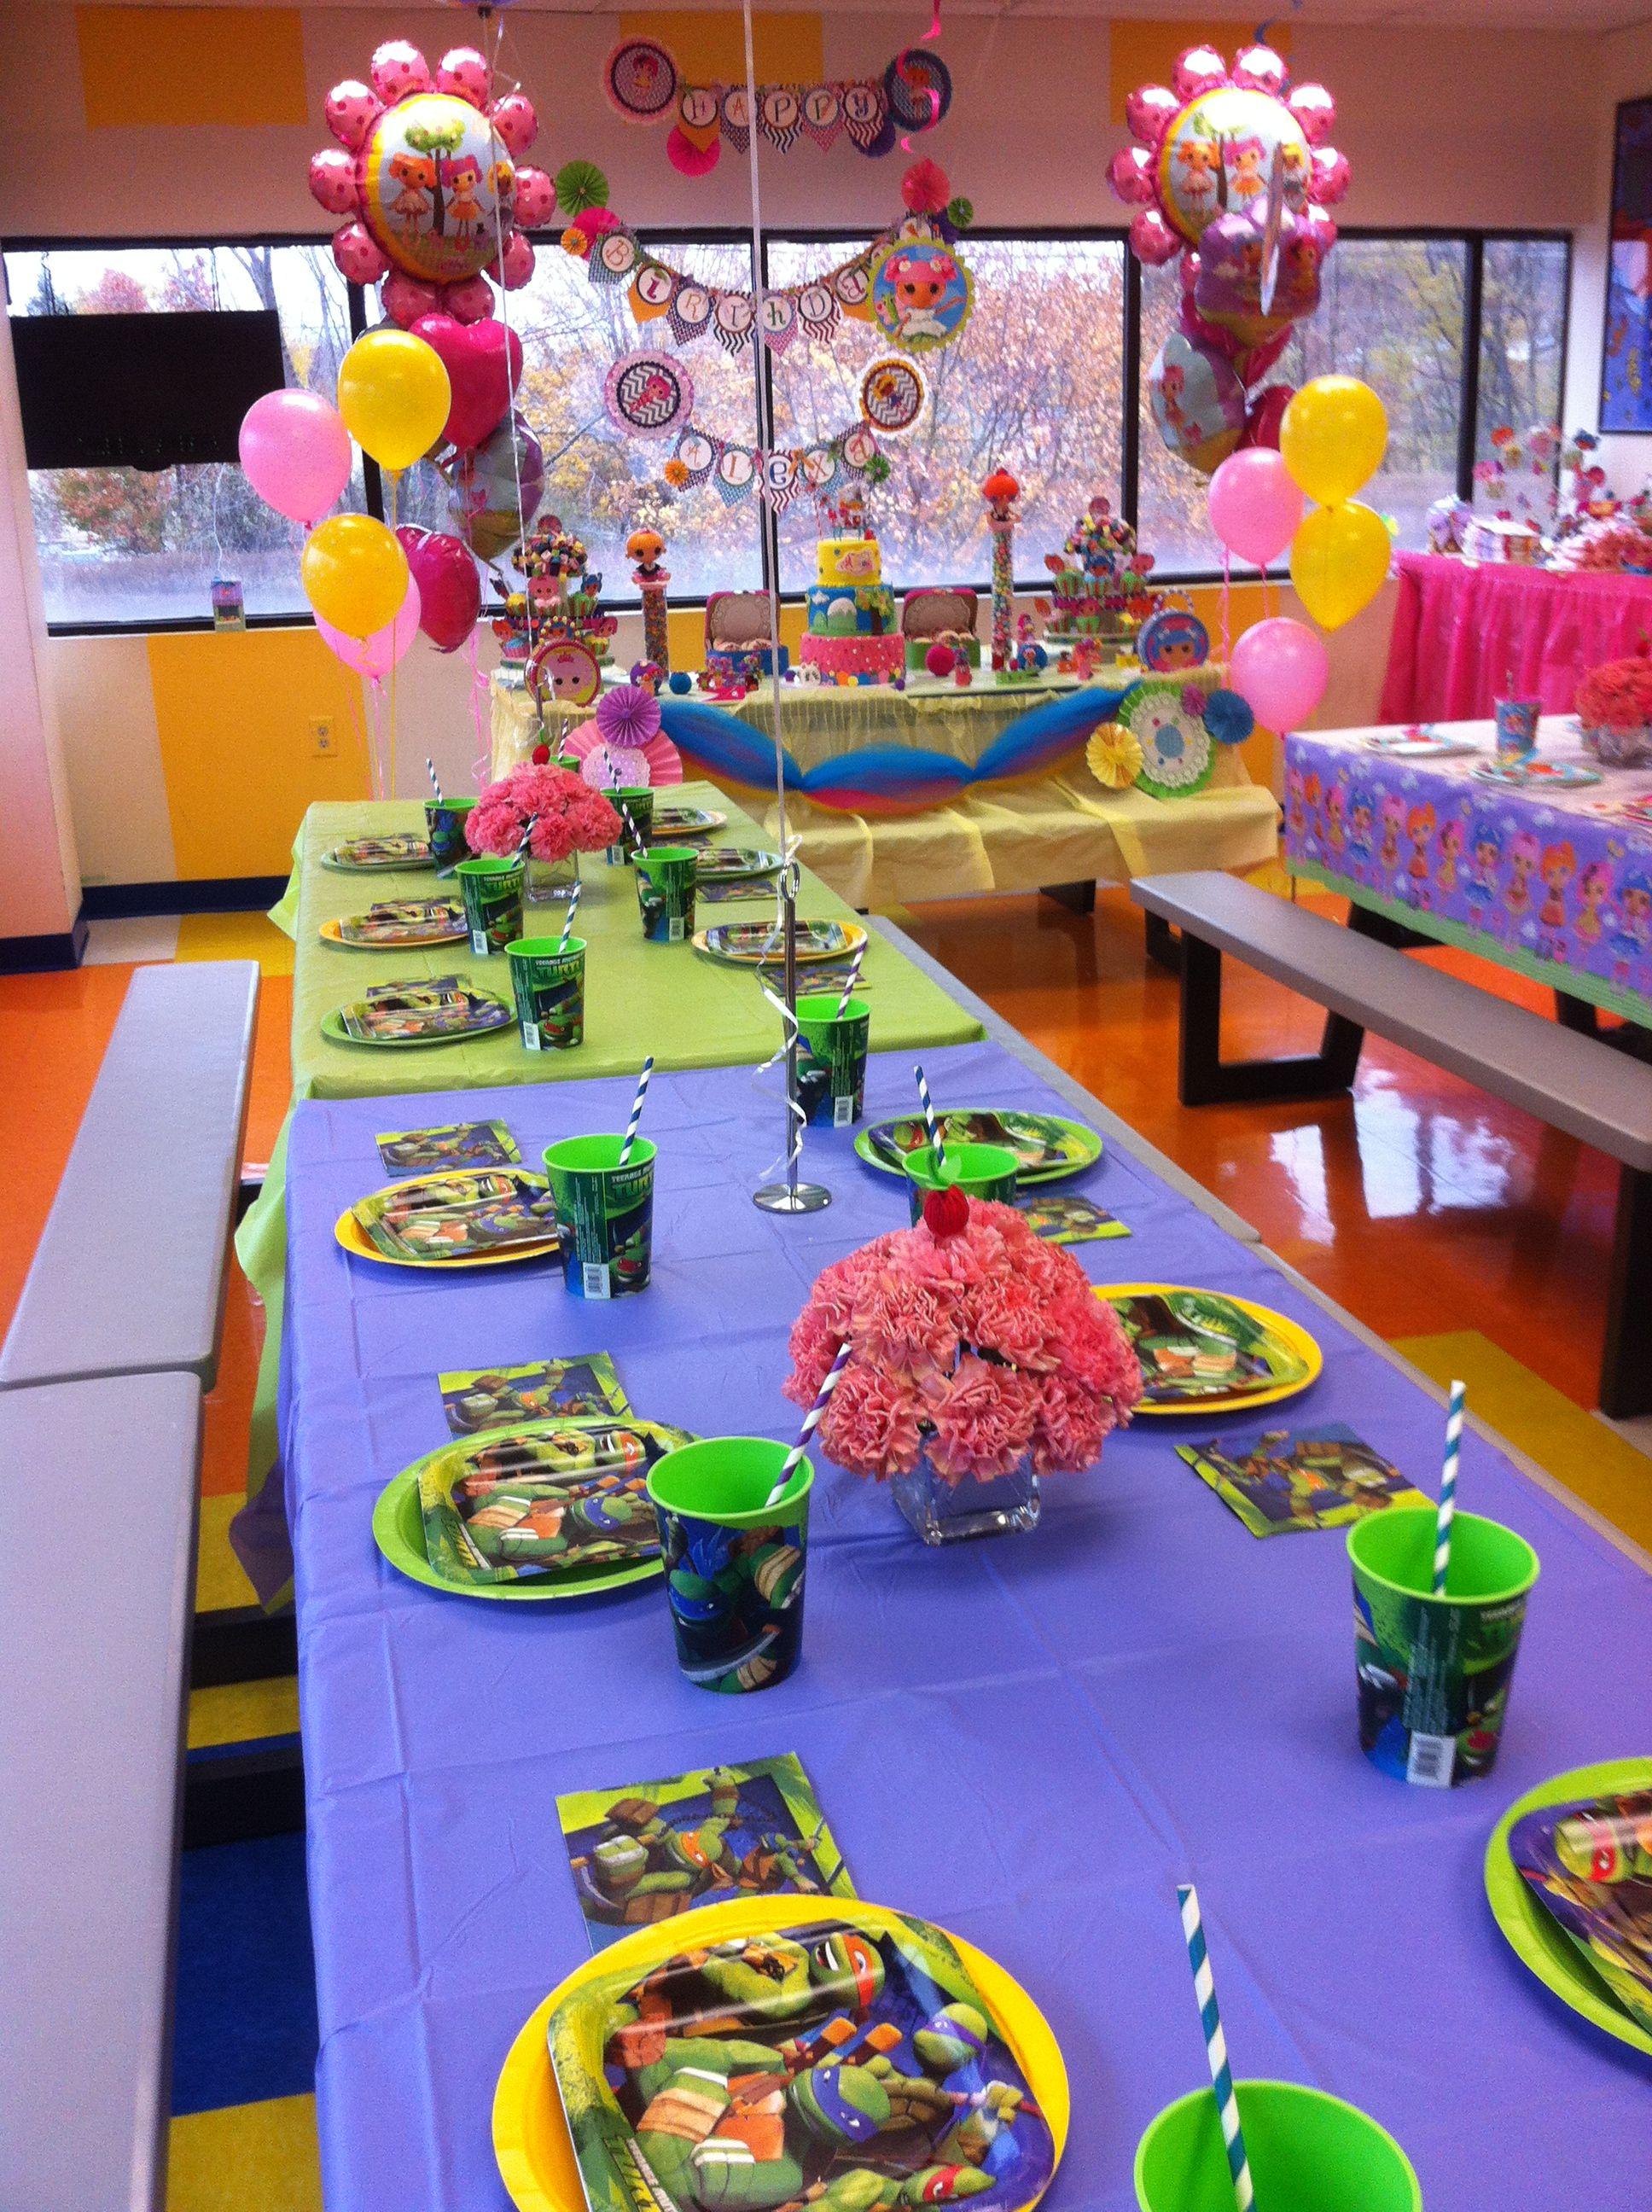 NInja Turtle Decoration for Boys at a Lalaloopsy Birthday Party Idea